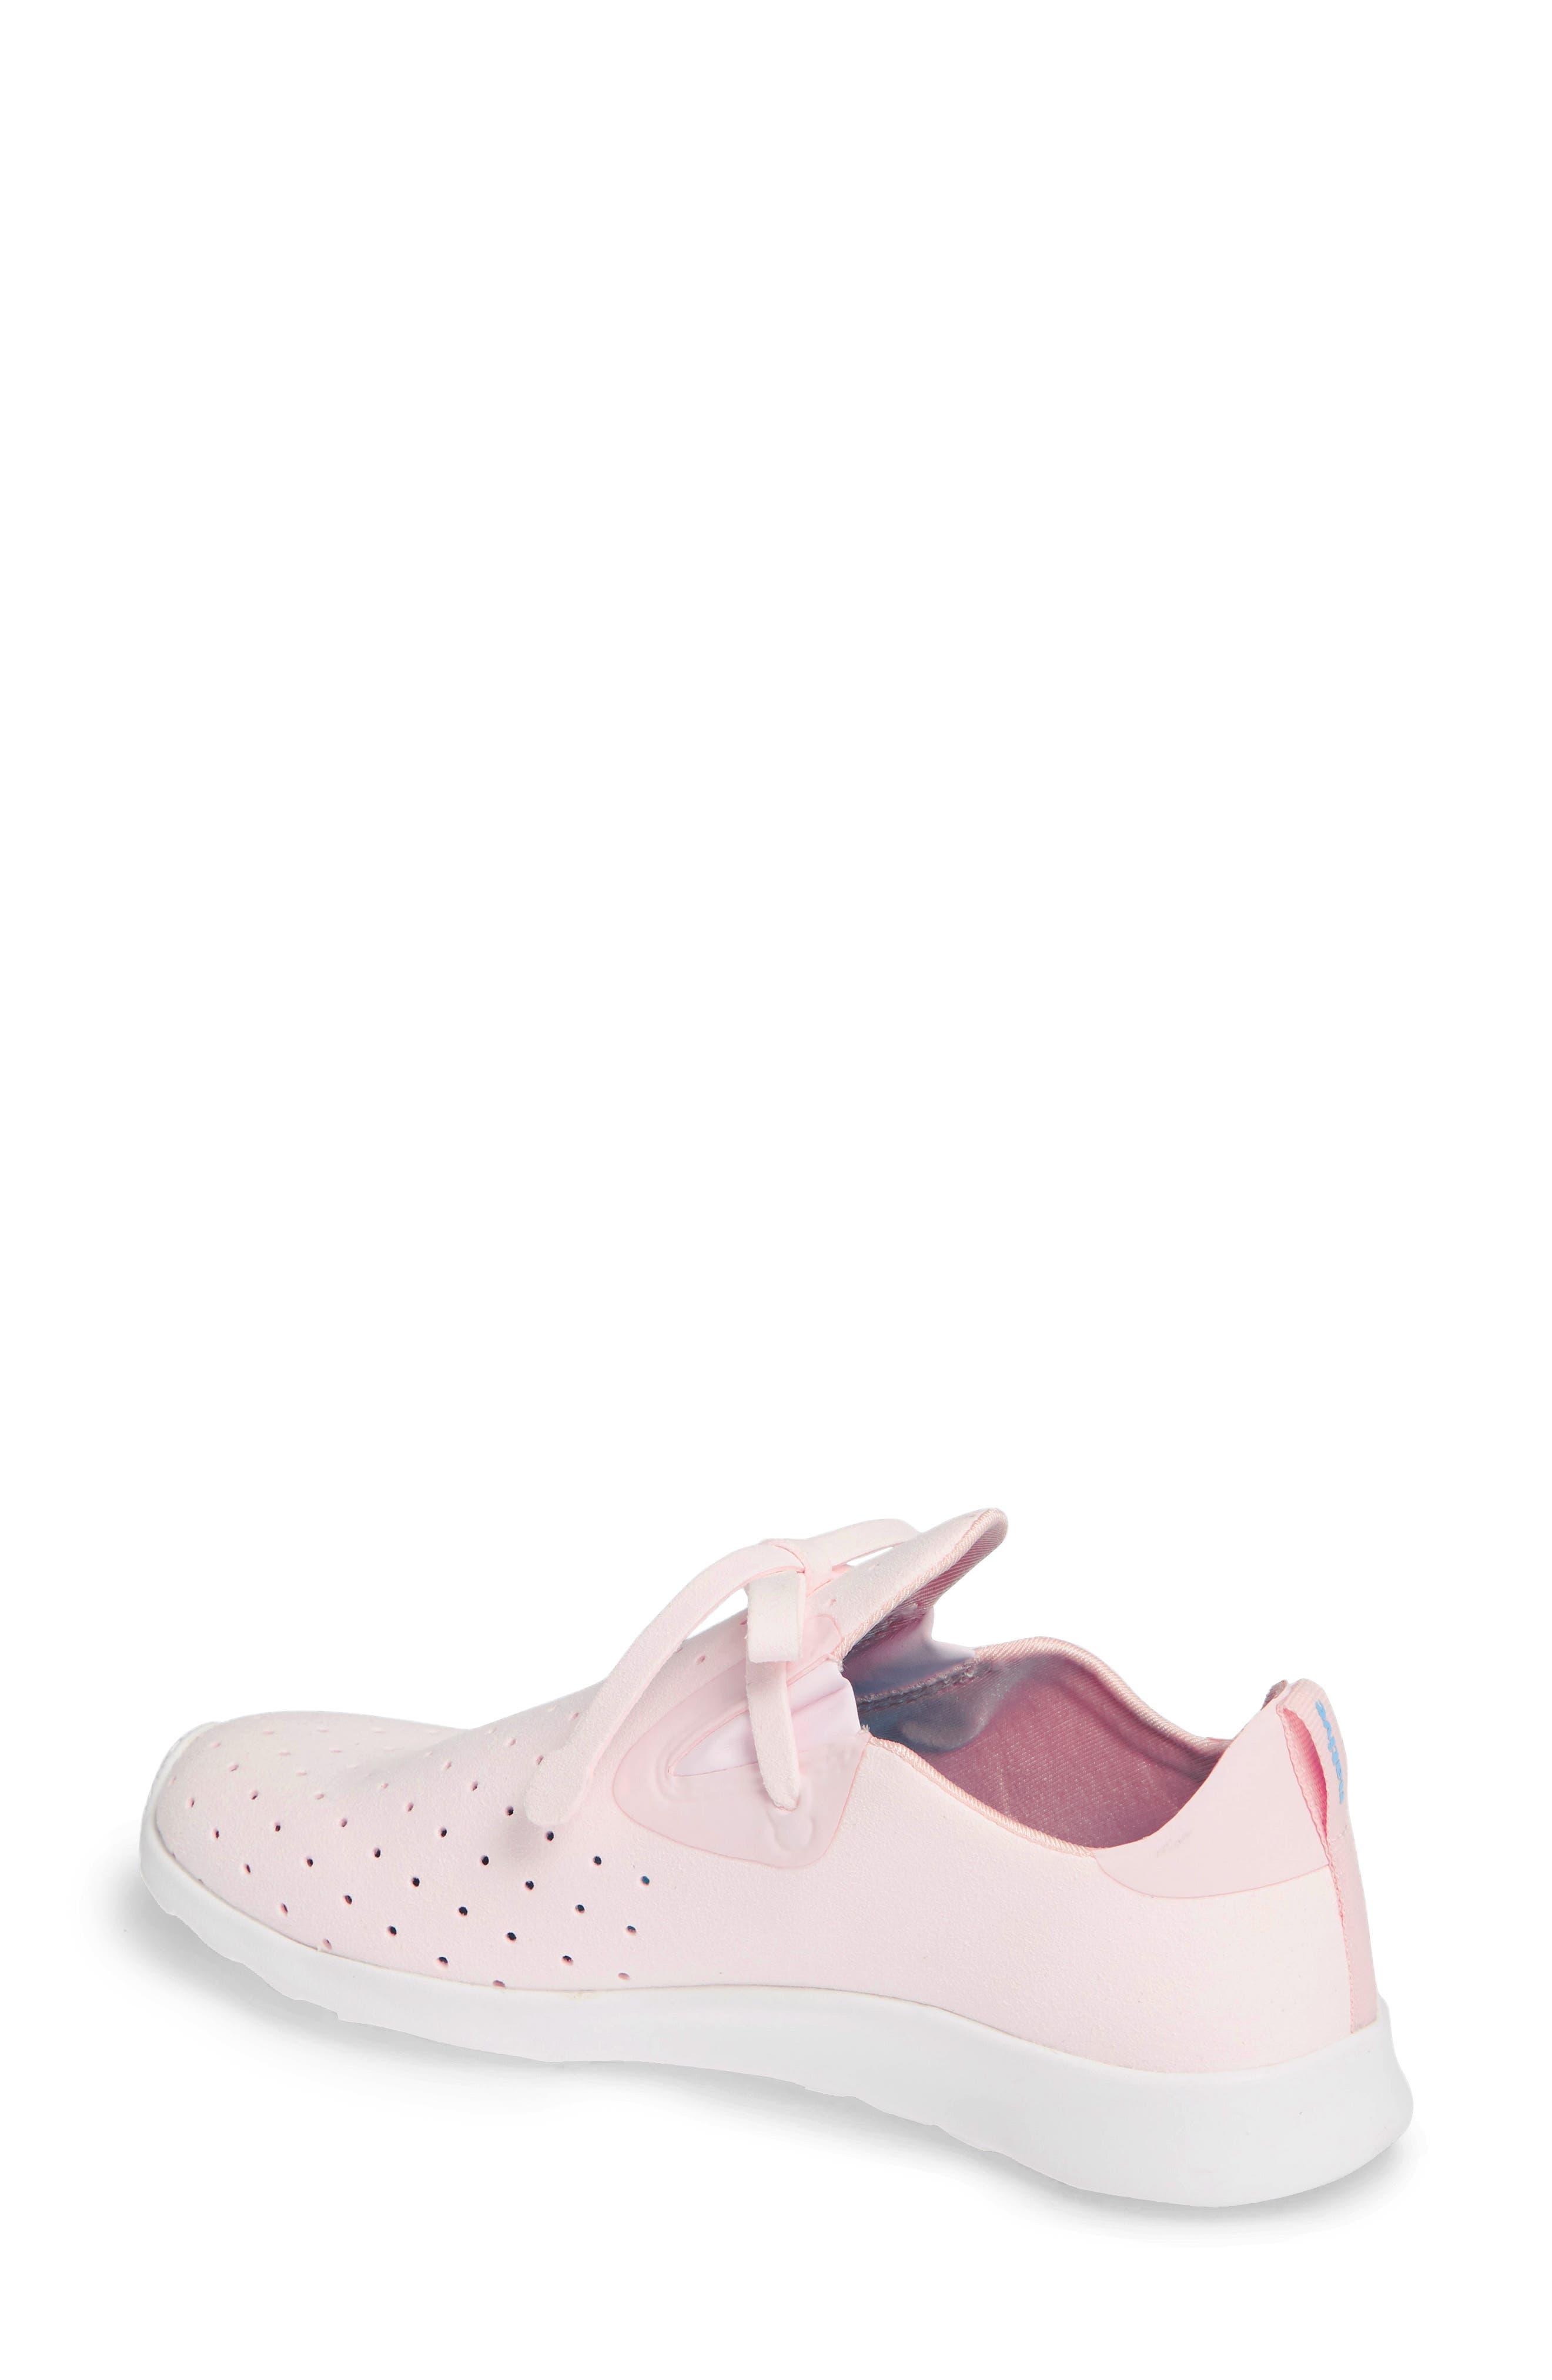 'Apollo' Perforated Sneaker,                             Alternate thumbnail 2, color,                             650